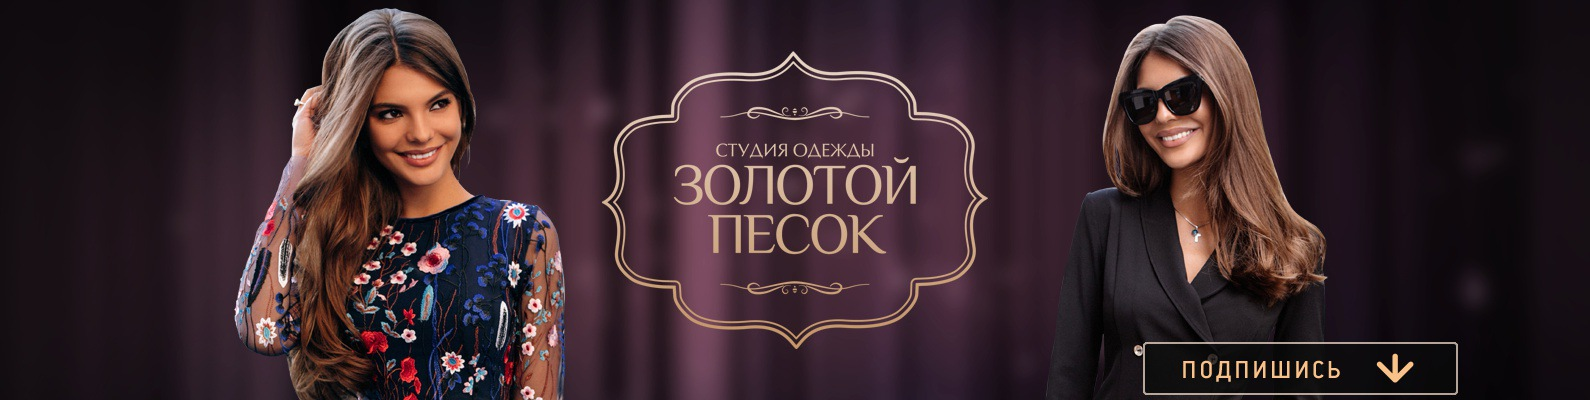 68d726c5f36 СТУДИЯ ОДЕЖДЫ